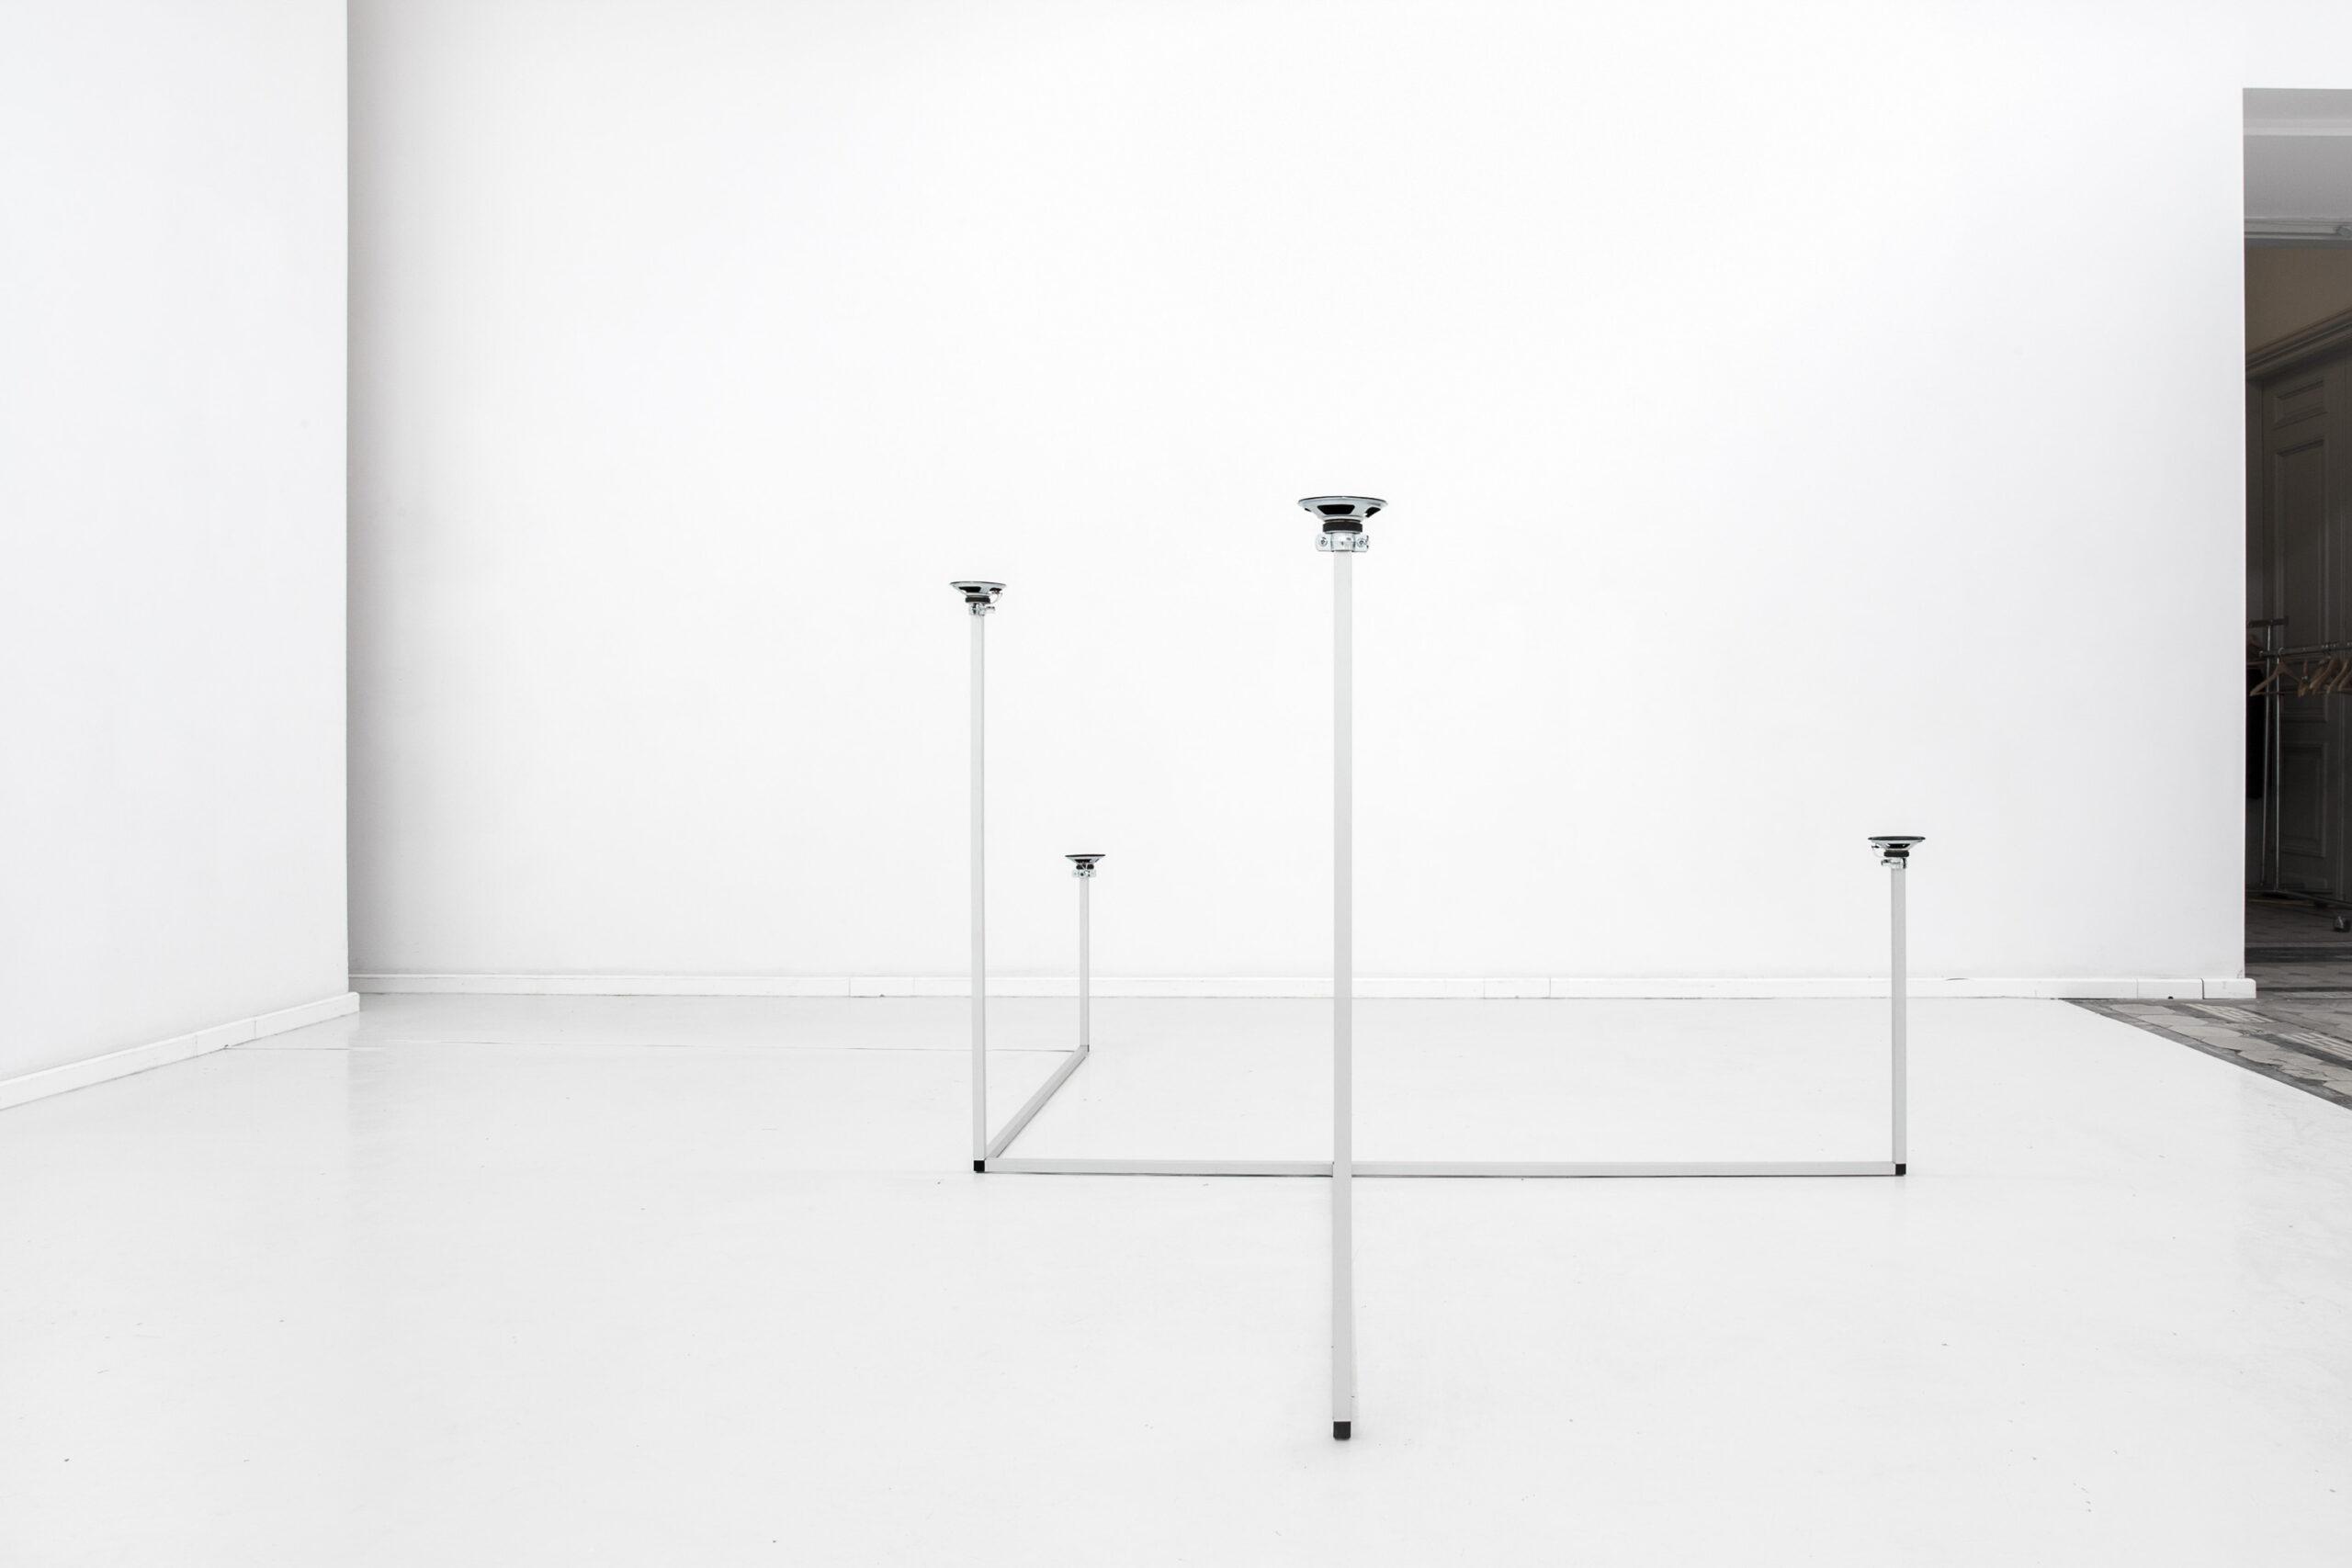 Jacek Doroszenko - How to travel - Sound installation - Warsaw - Exhibition 01